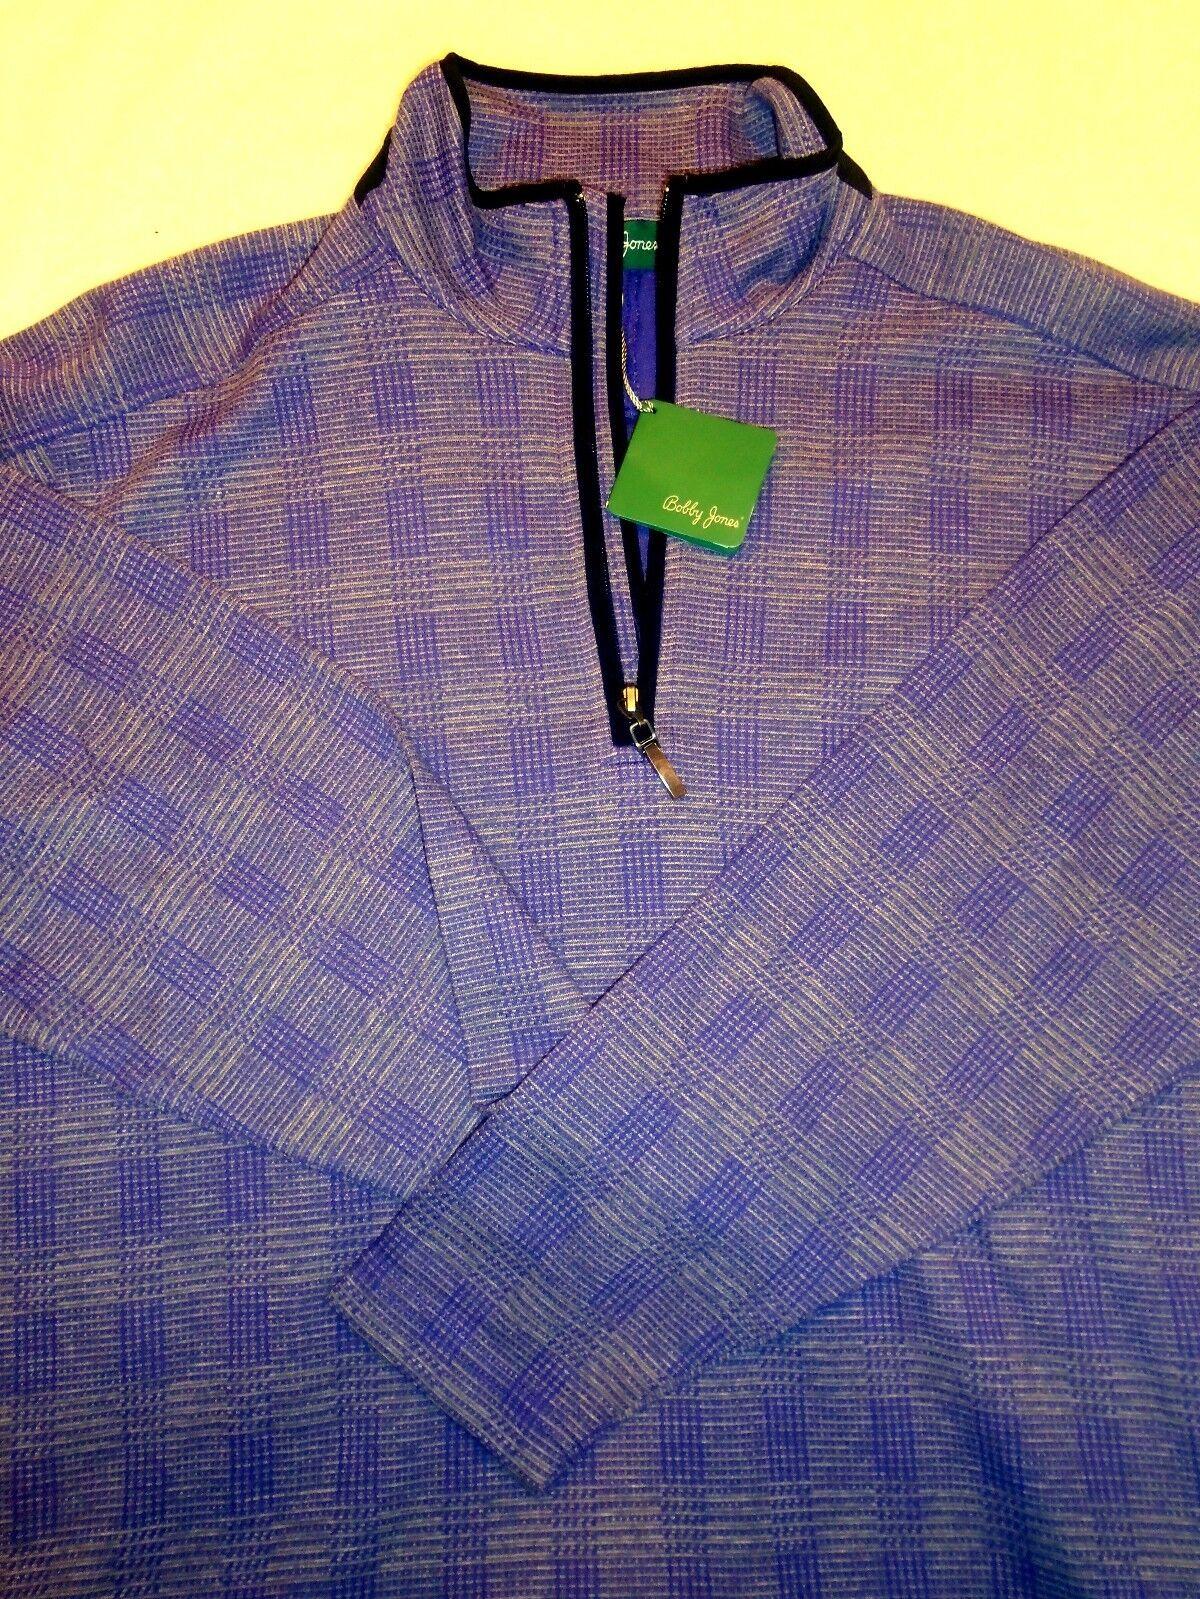 Bobby Jones 12 Zip Purple Amherst Plaid Pattern Pullover Medium Ebay